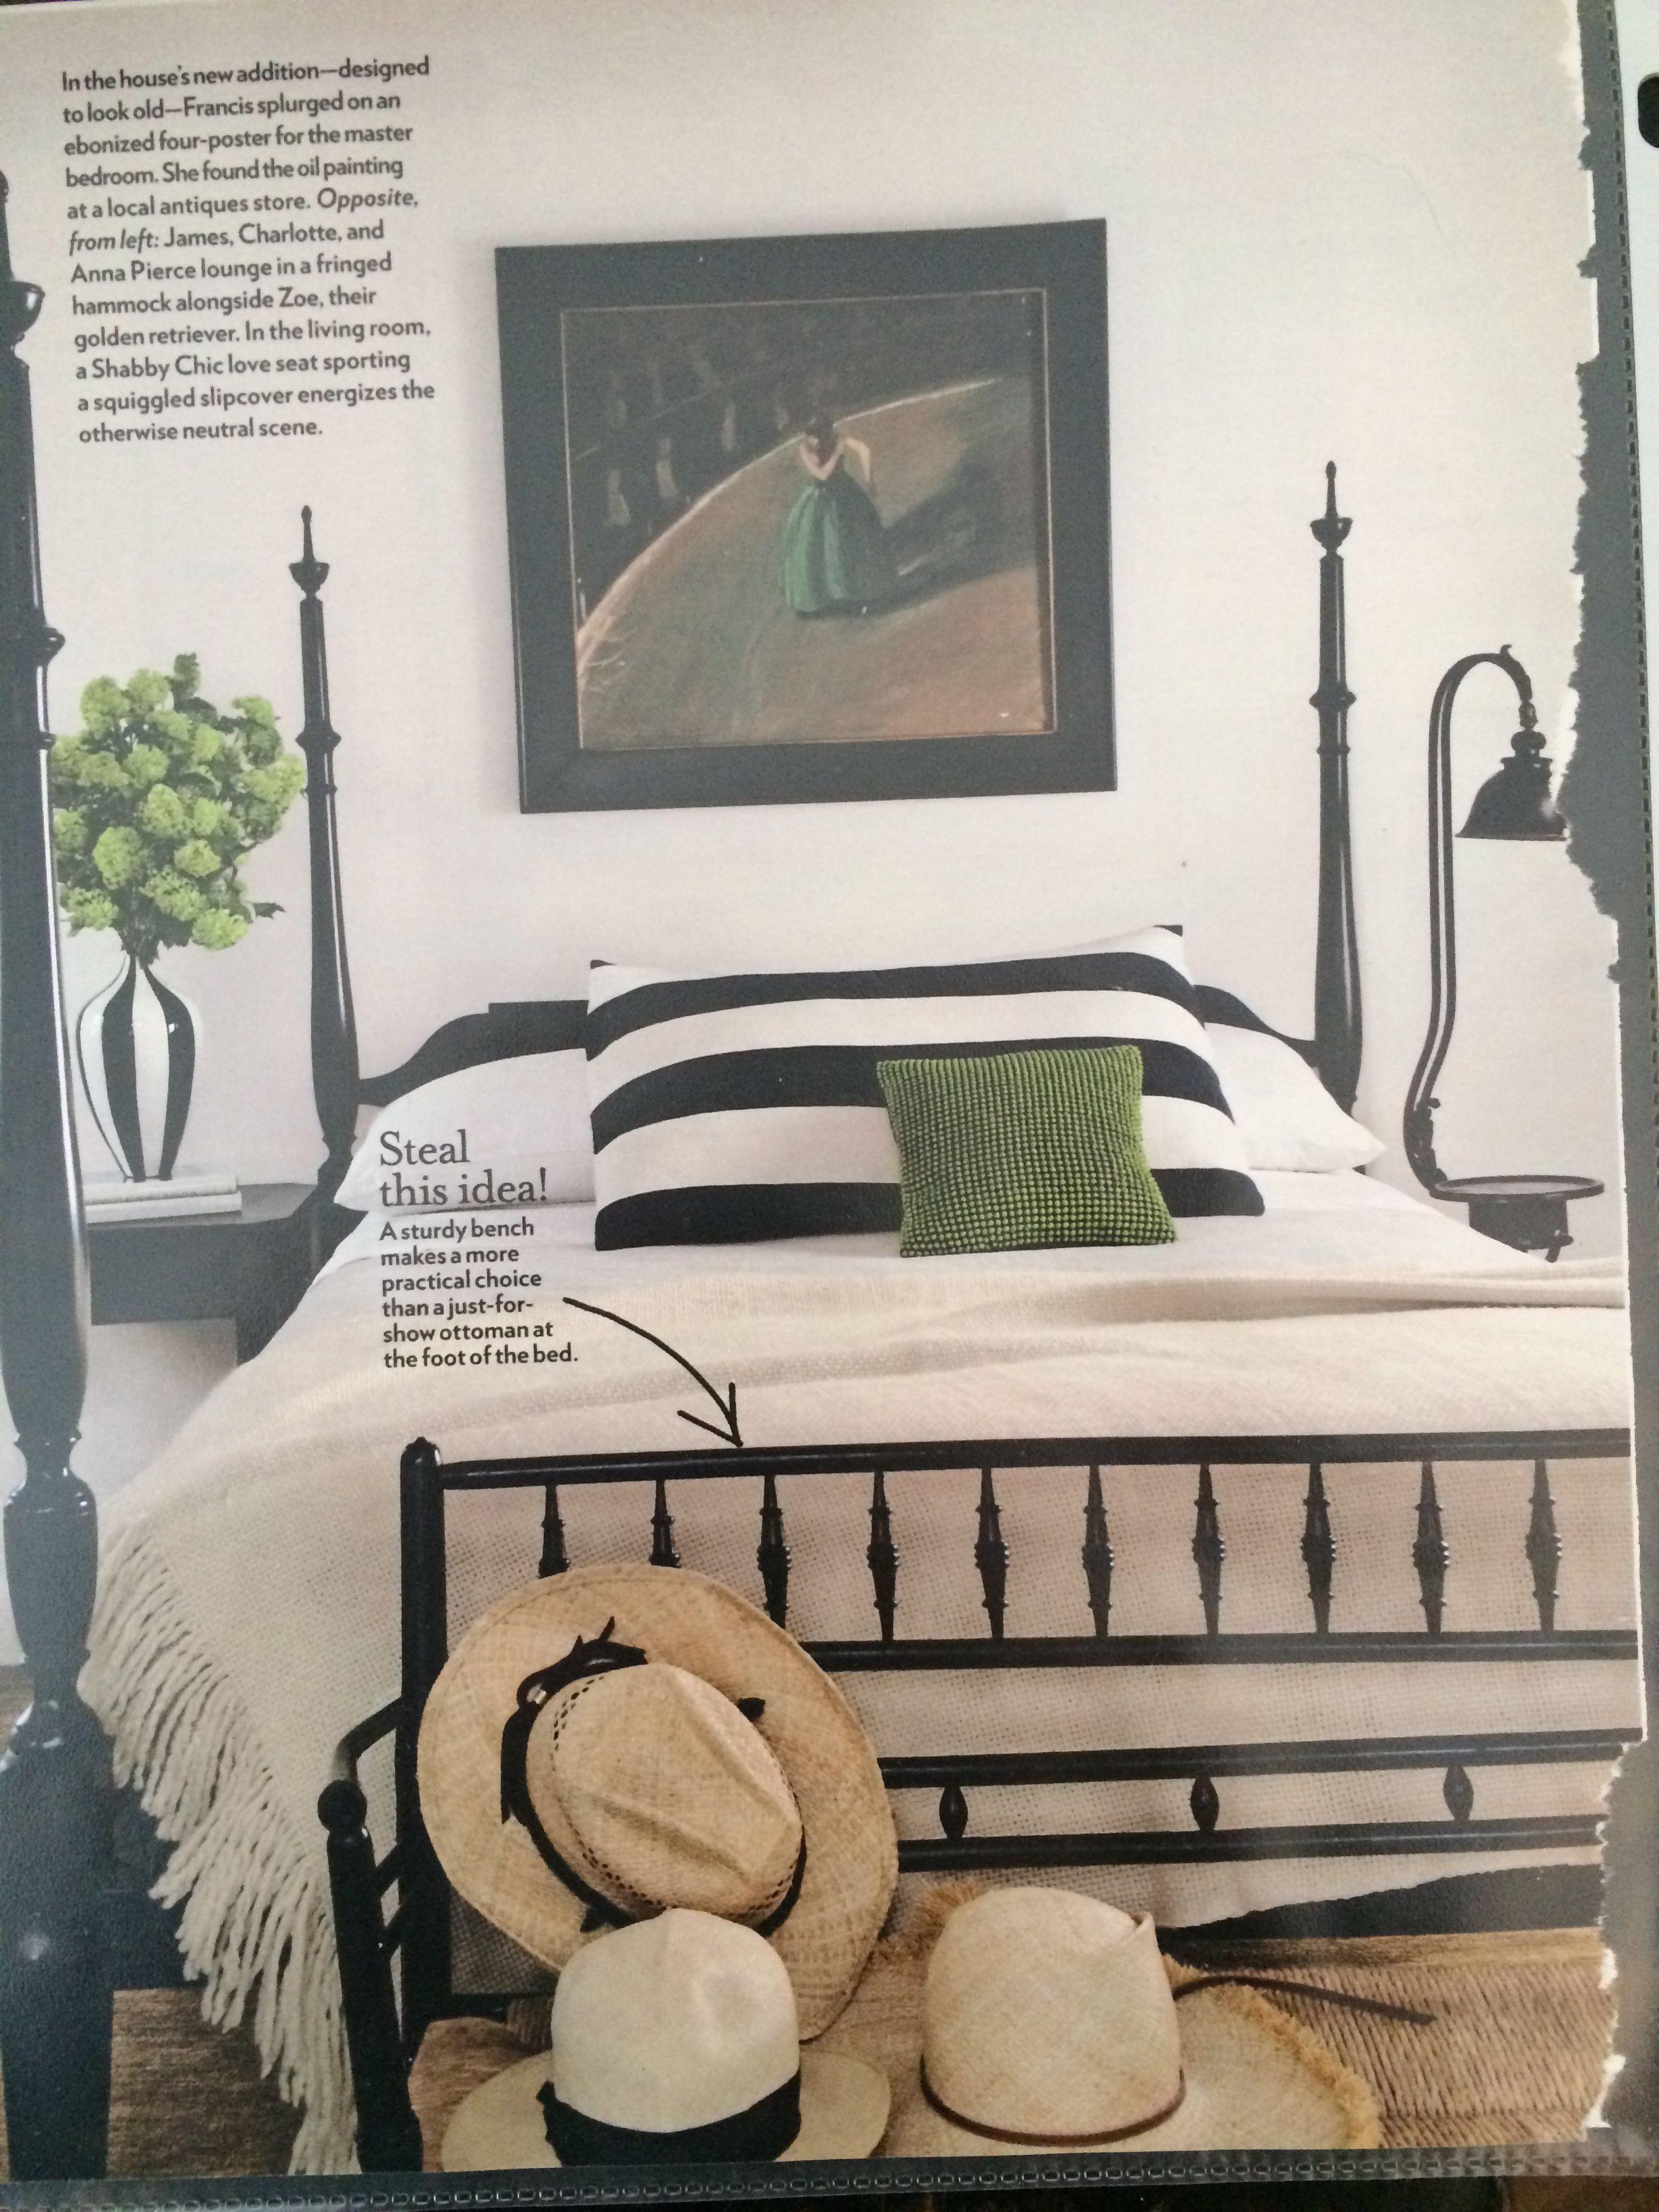 Calm vintagey bedroom Calm vintagey bedroom